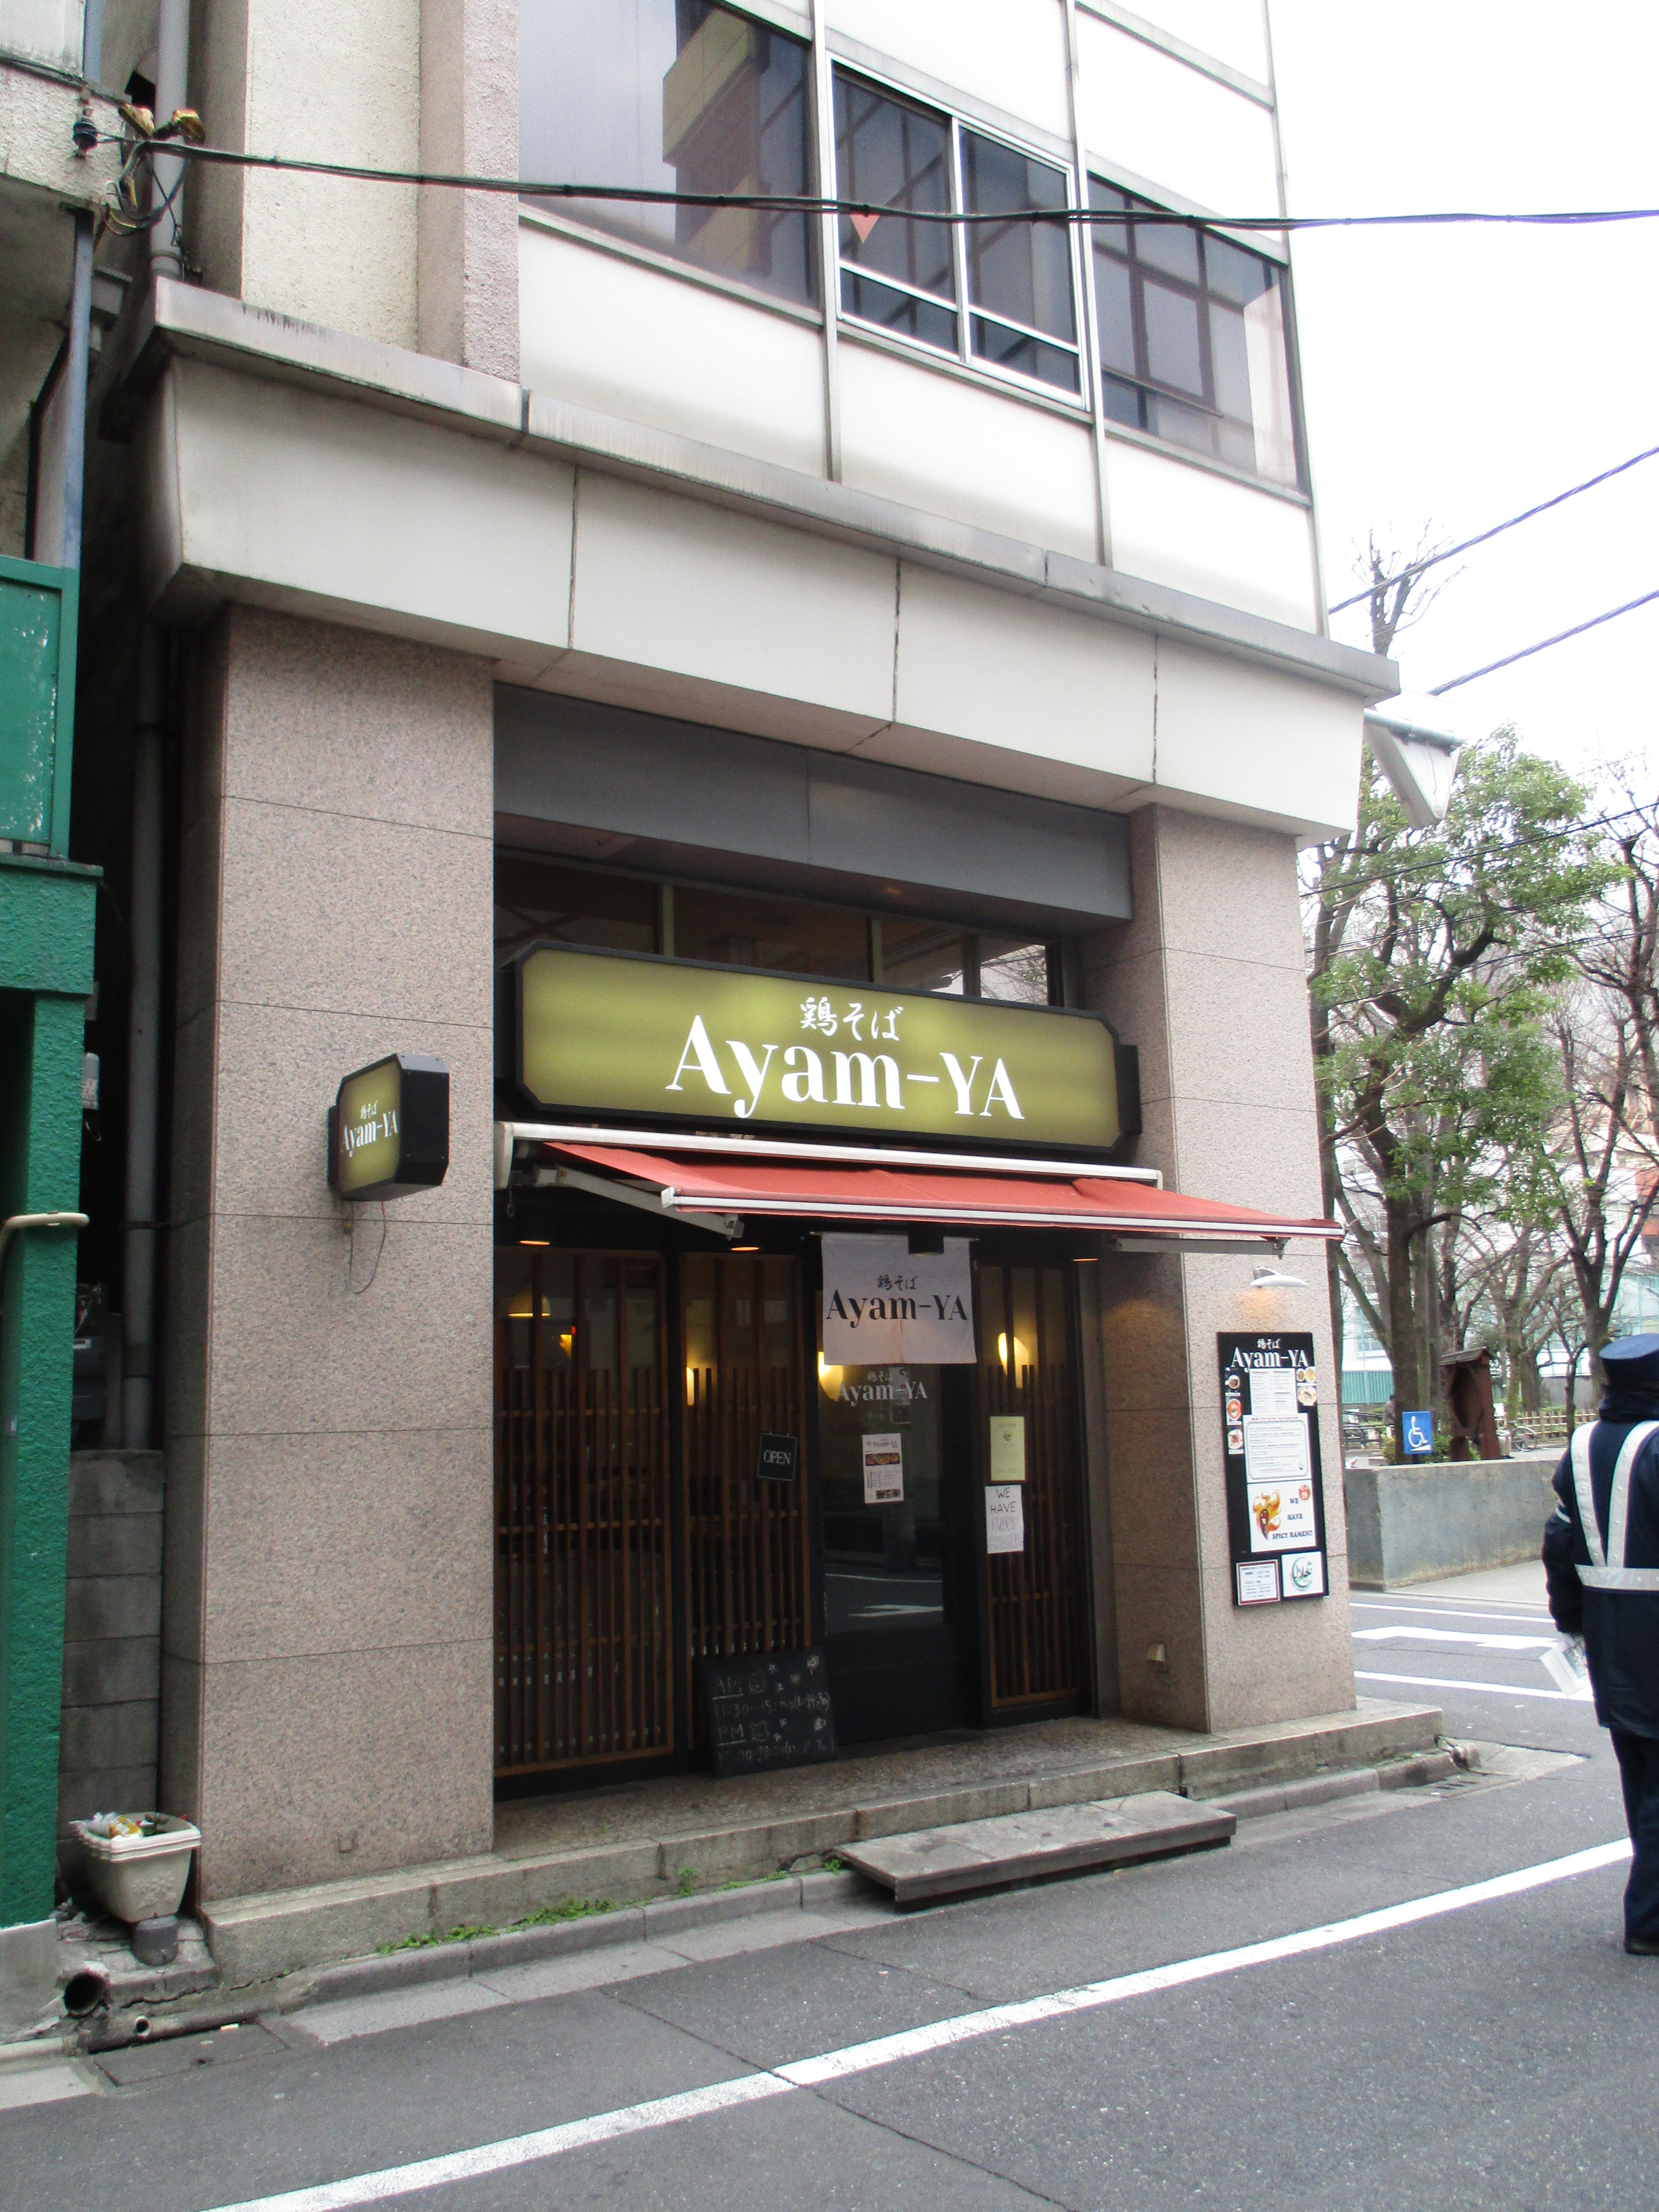 Ramen Halal di Tokyo: Ayam-ya vs Narita-ya - Intergalactic ...